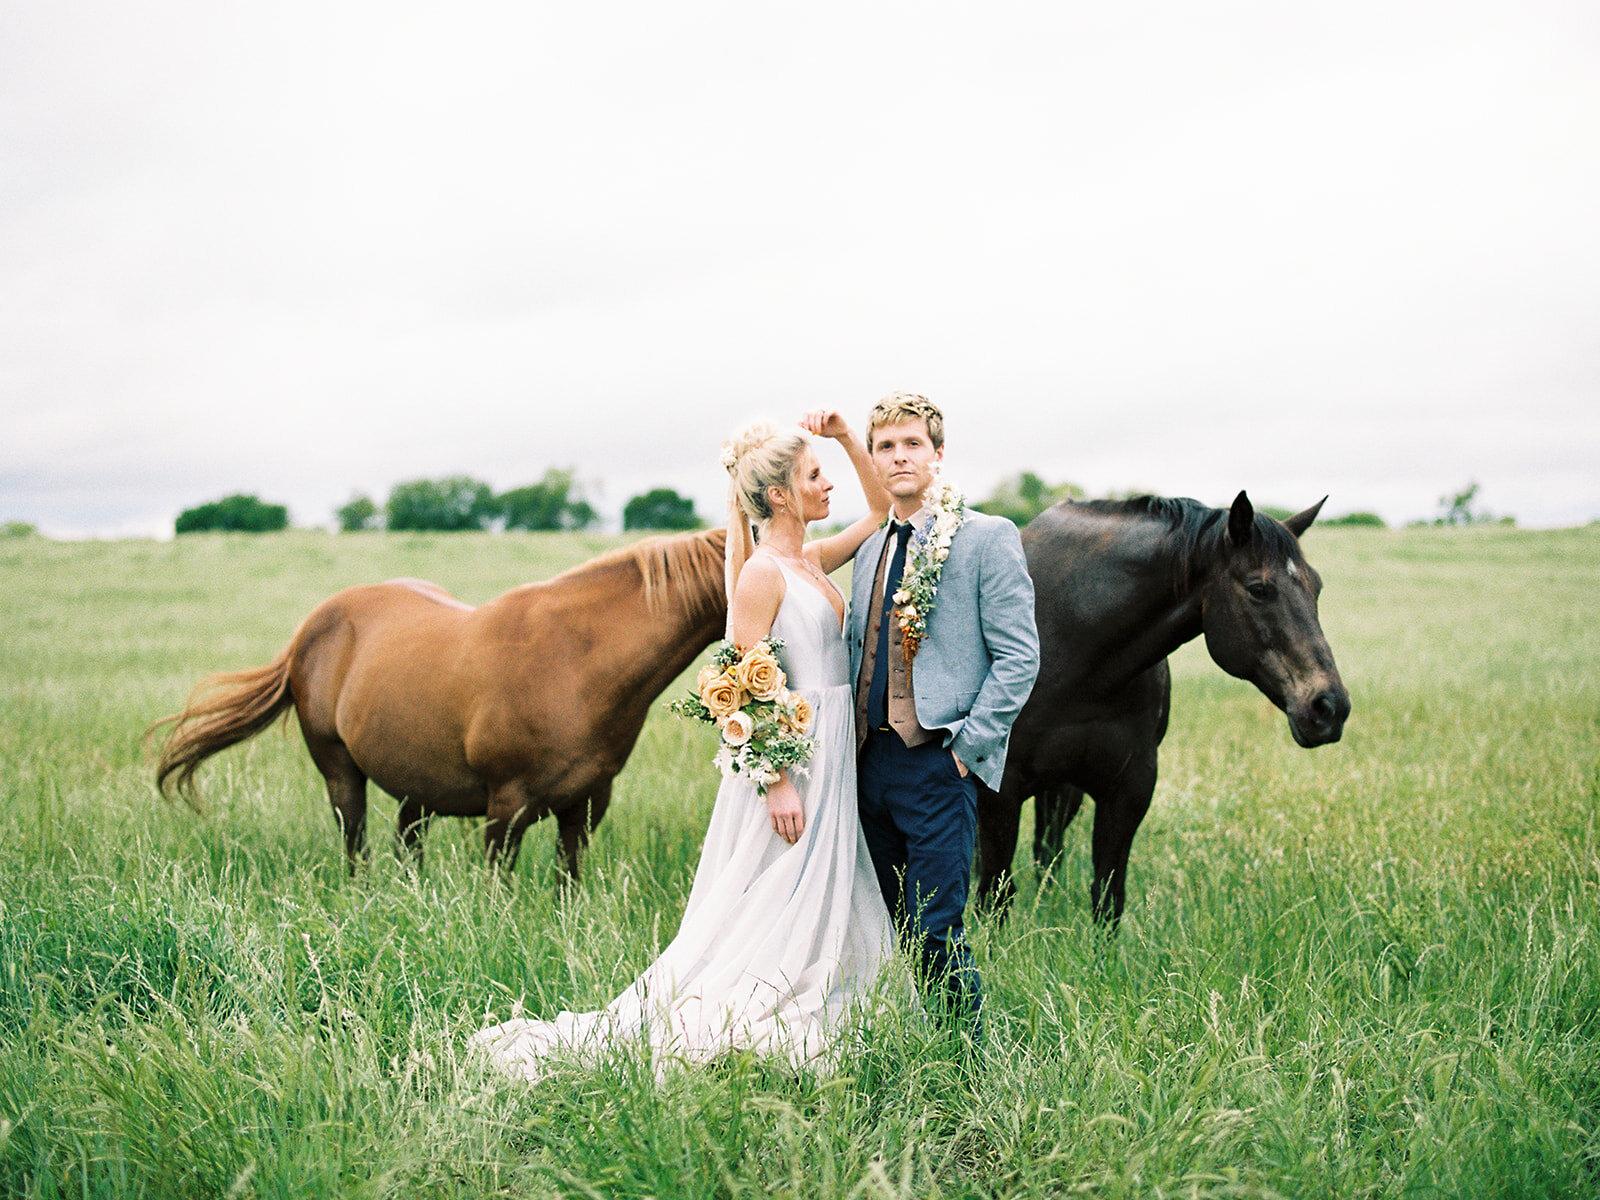 Texas wedding with horses